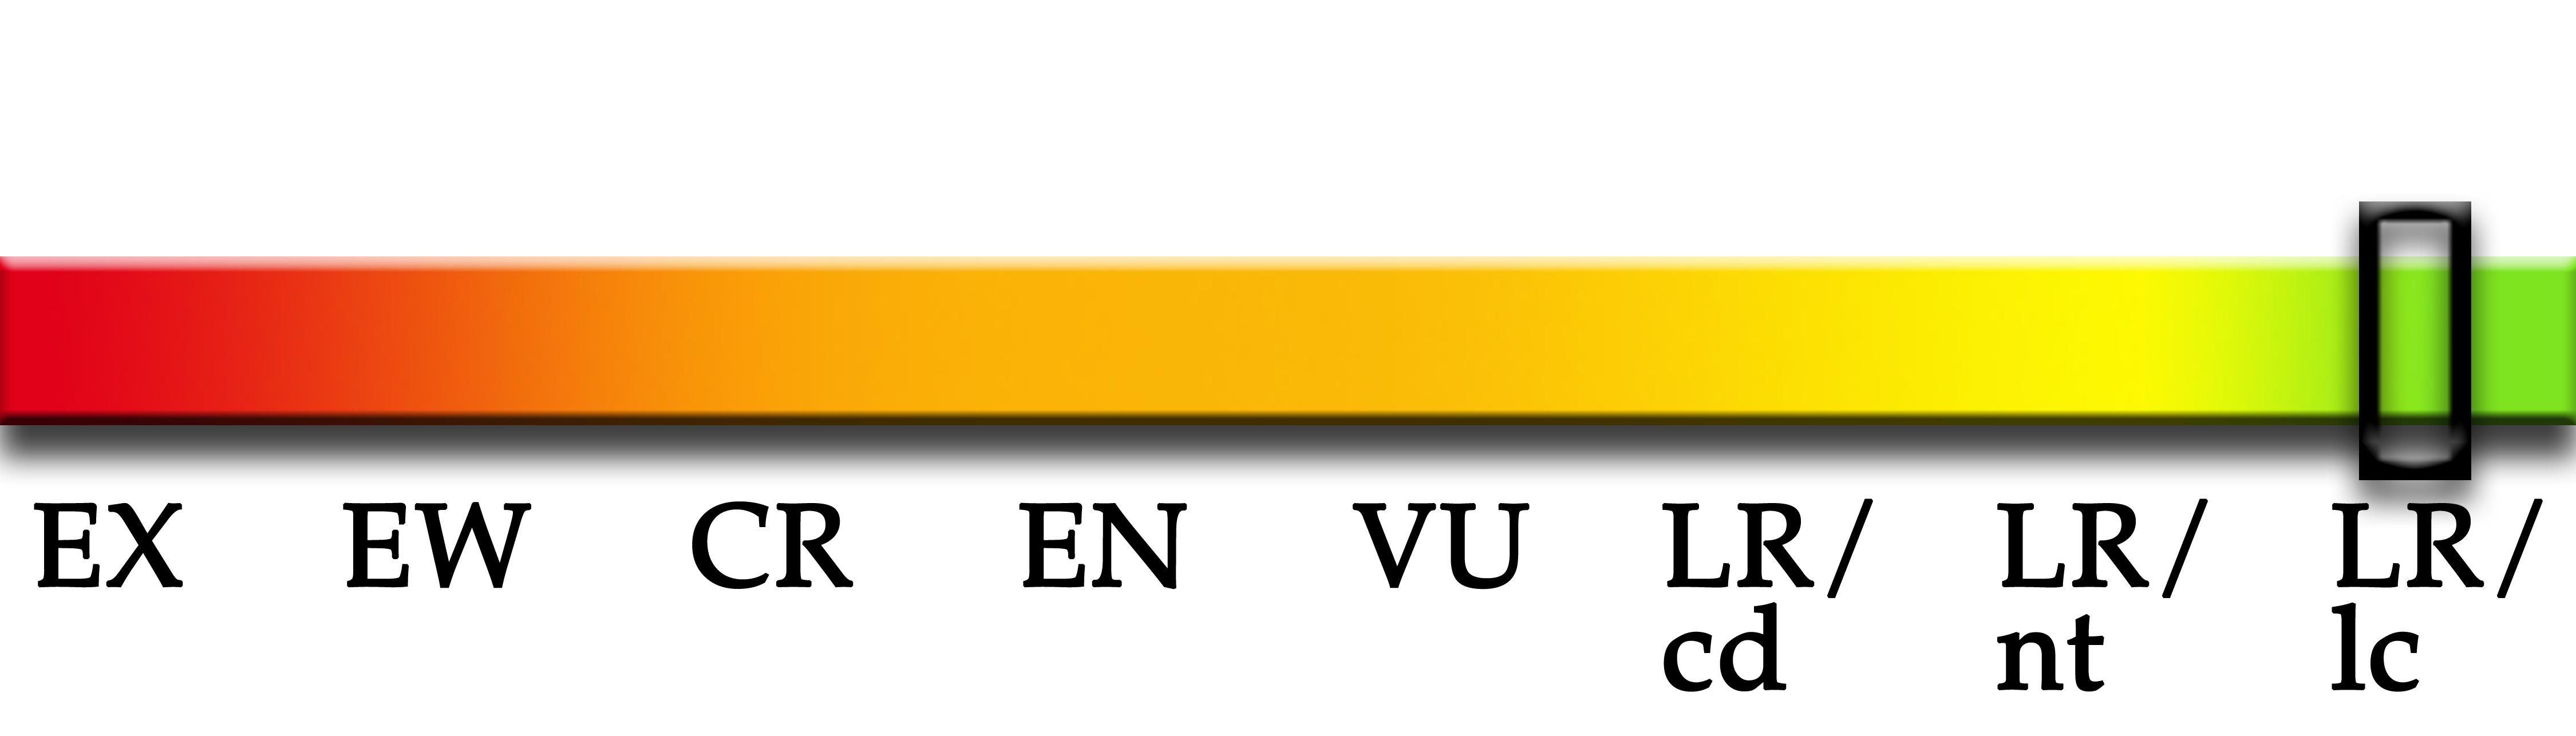 statusbar